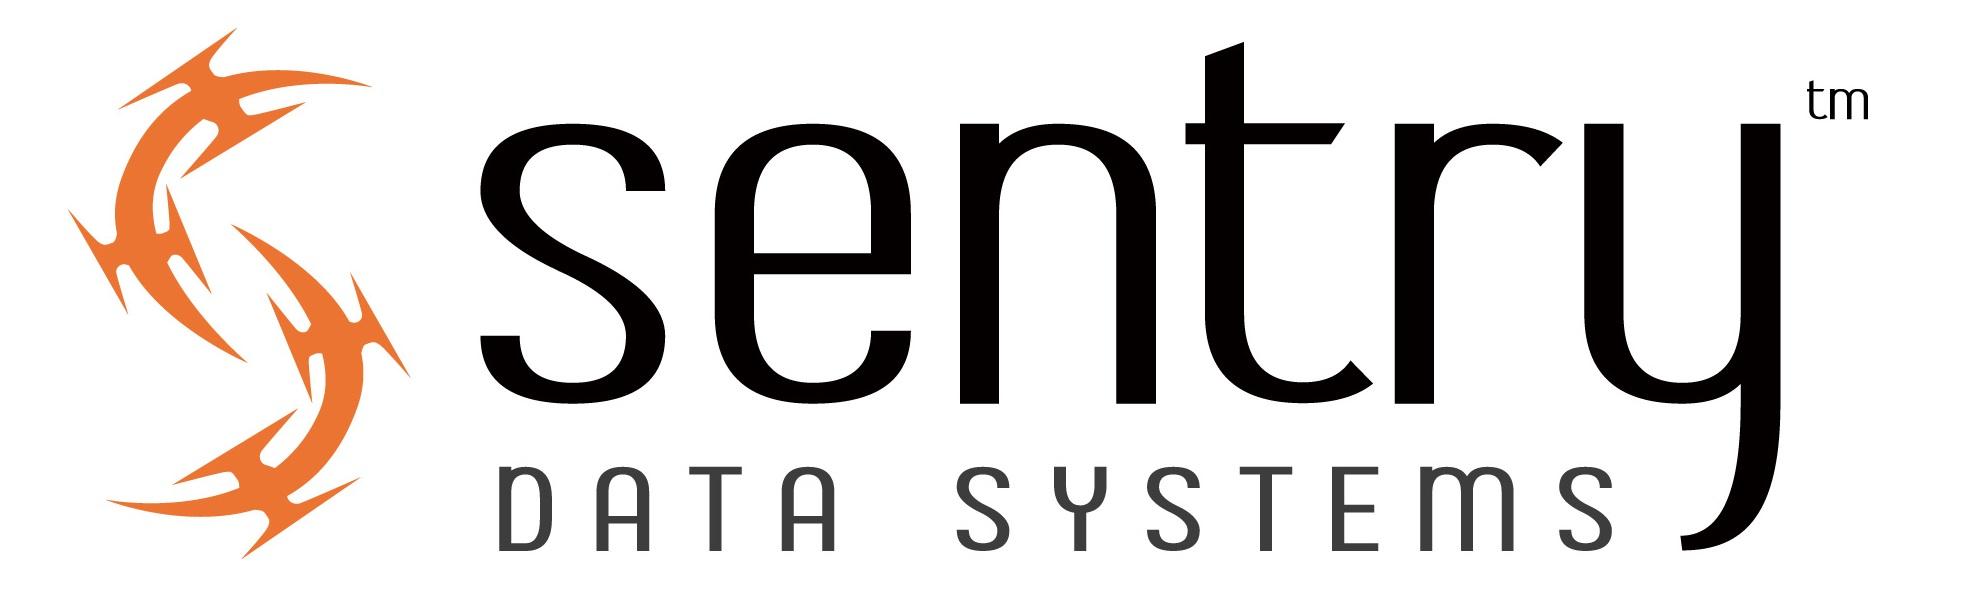 Sentry Data Systems Feedback